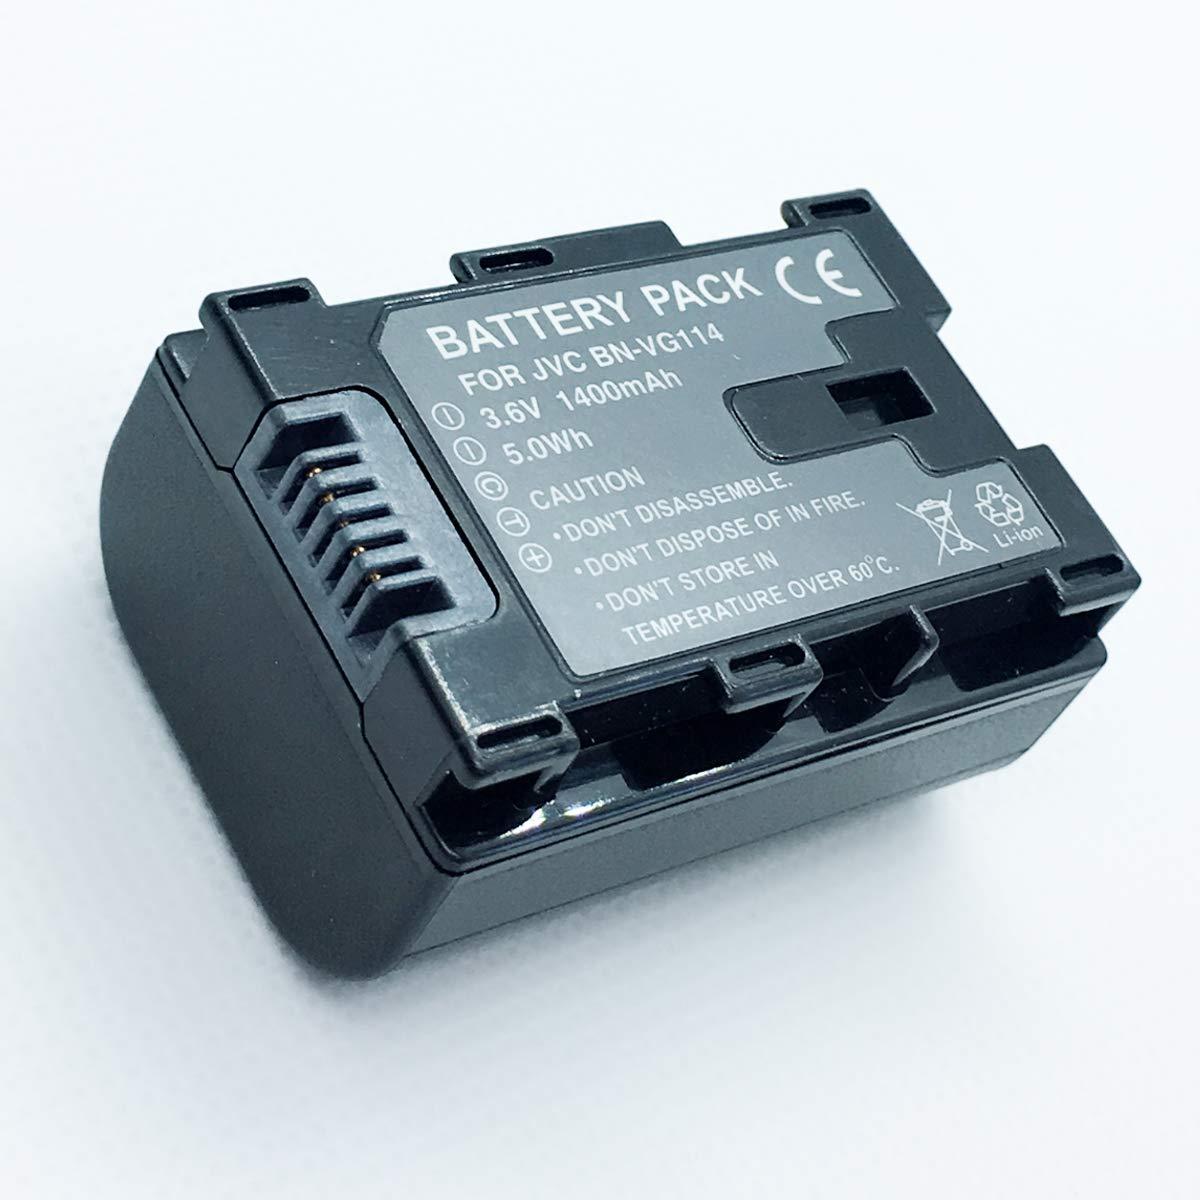 Amazon.com : Rechargeable Battery Pack For JVC Everio GZ-HM440AU, GZ-HM440BU,  GZ-HM440RU HD Flash Memory Camcorder : Camera & Photo